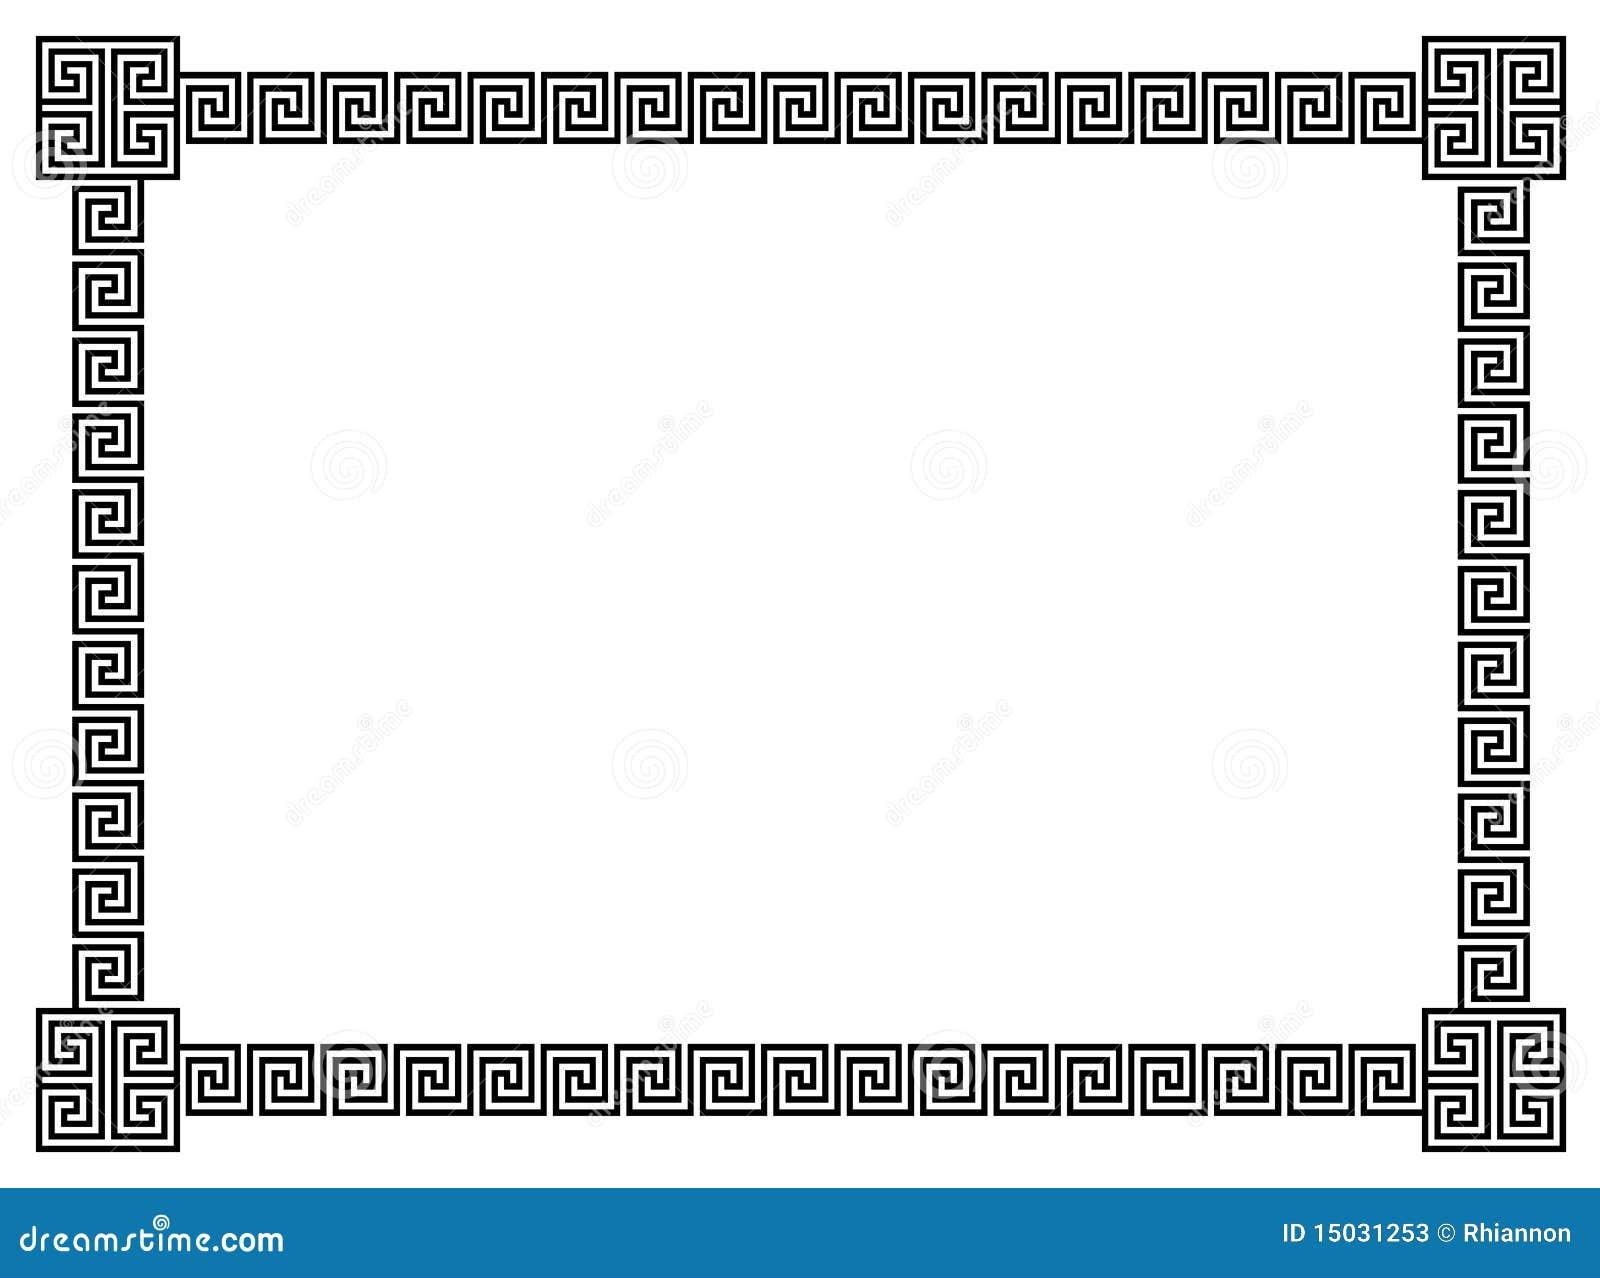 Geometrical Scrolls Border Stock Photos - Image: 15031253